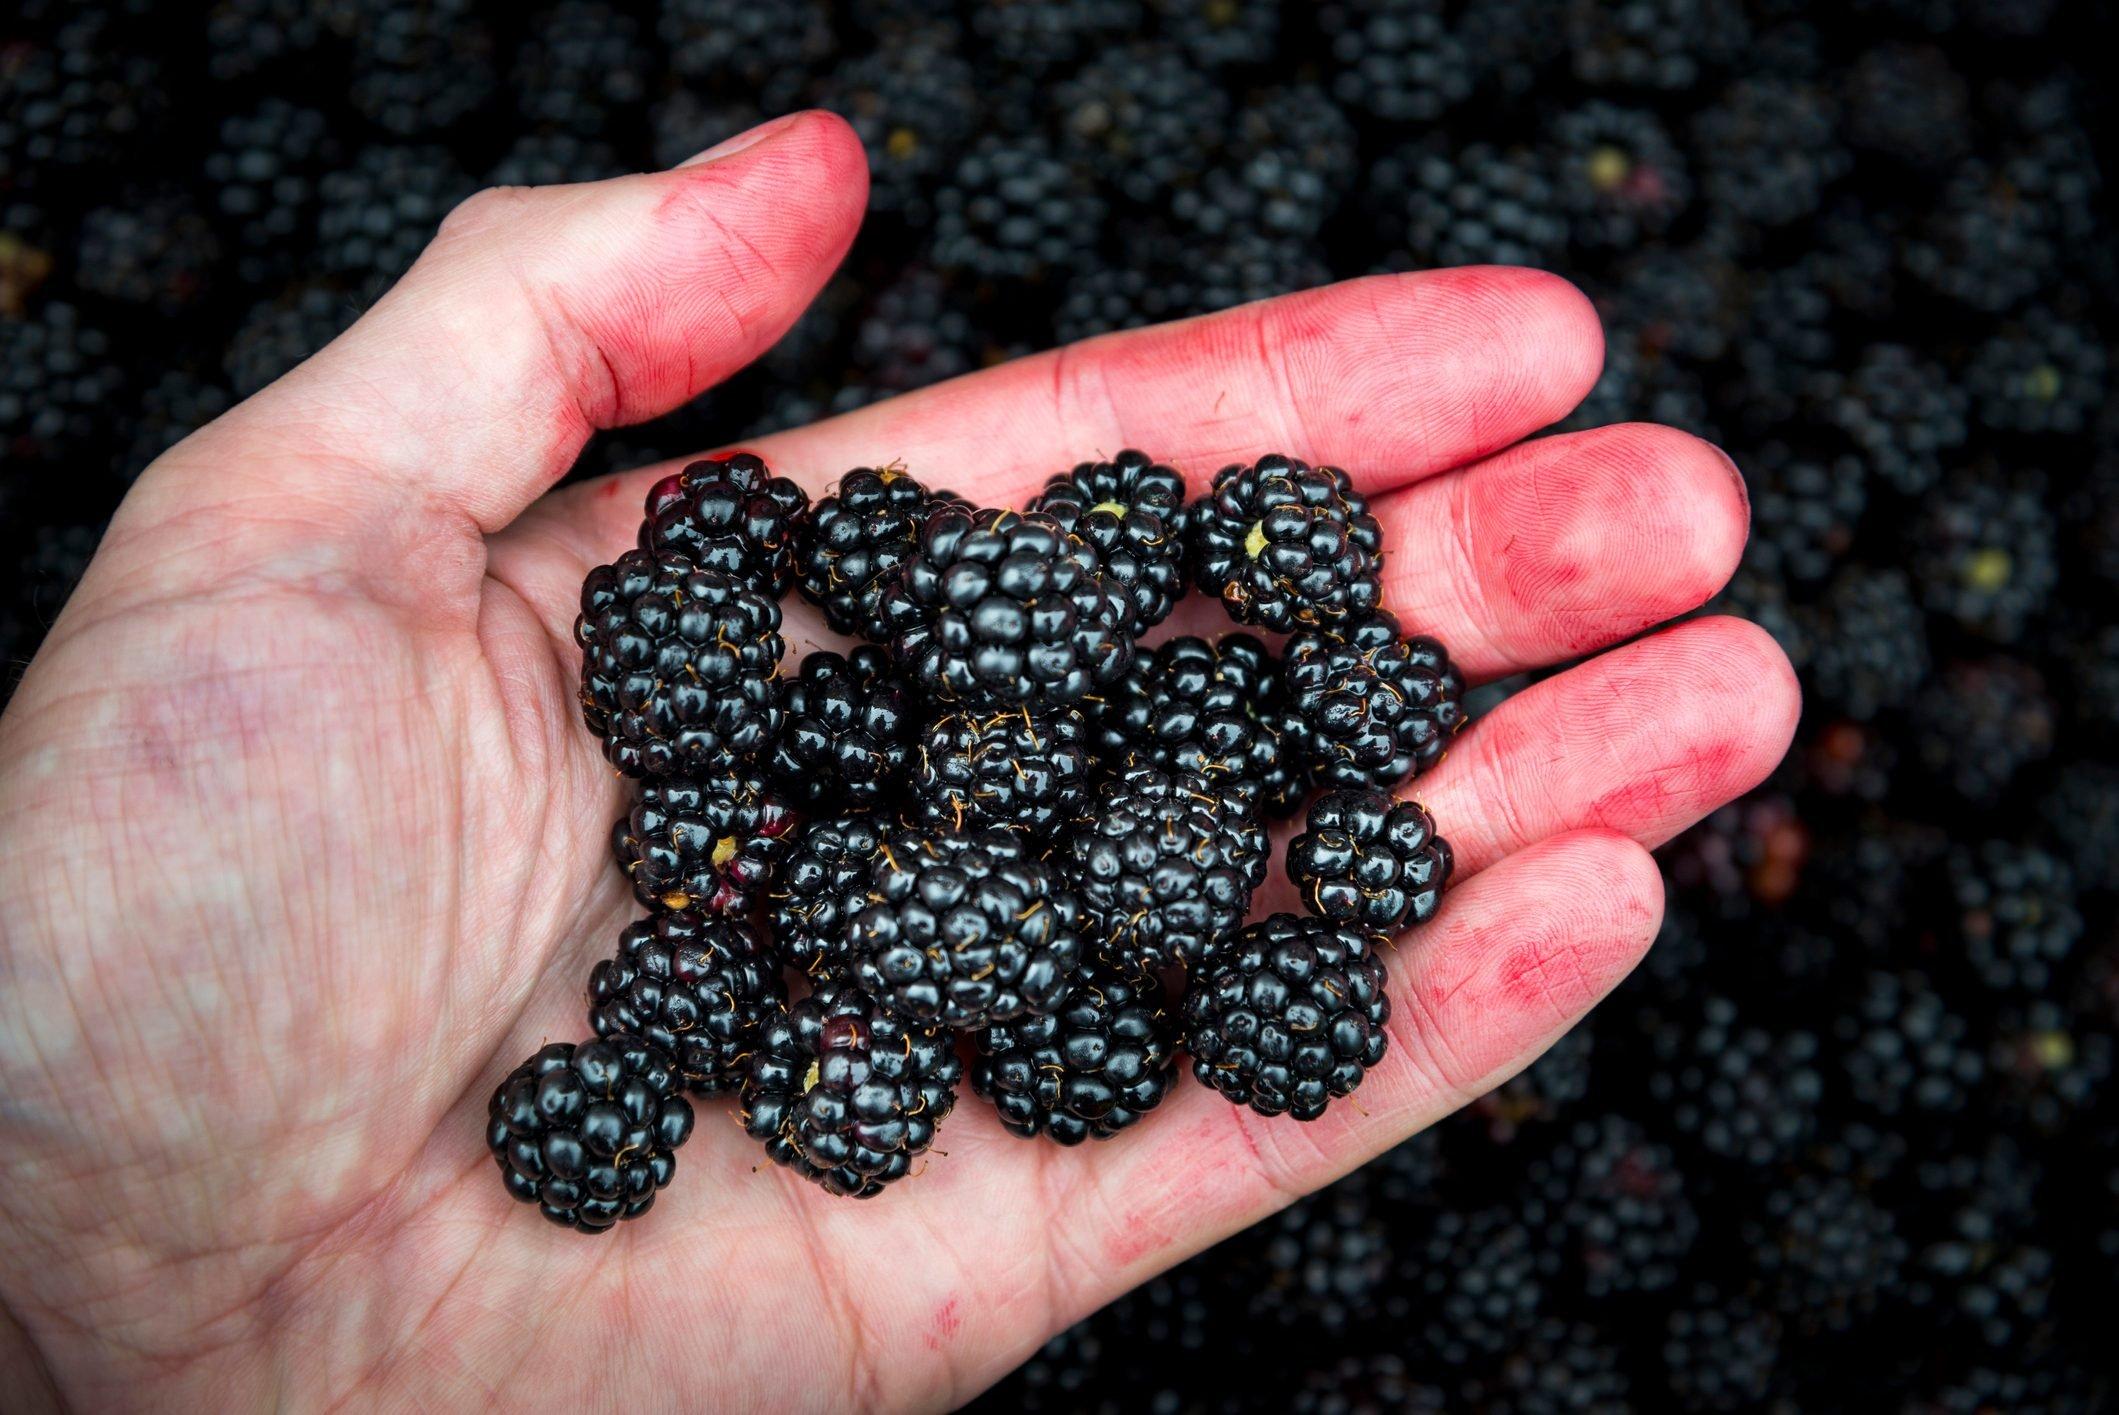 Juice stained hand holding freshly picked wild blackberries